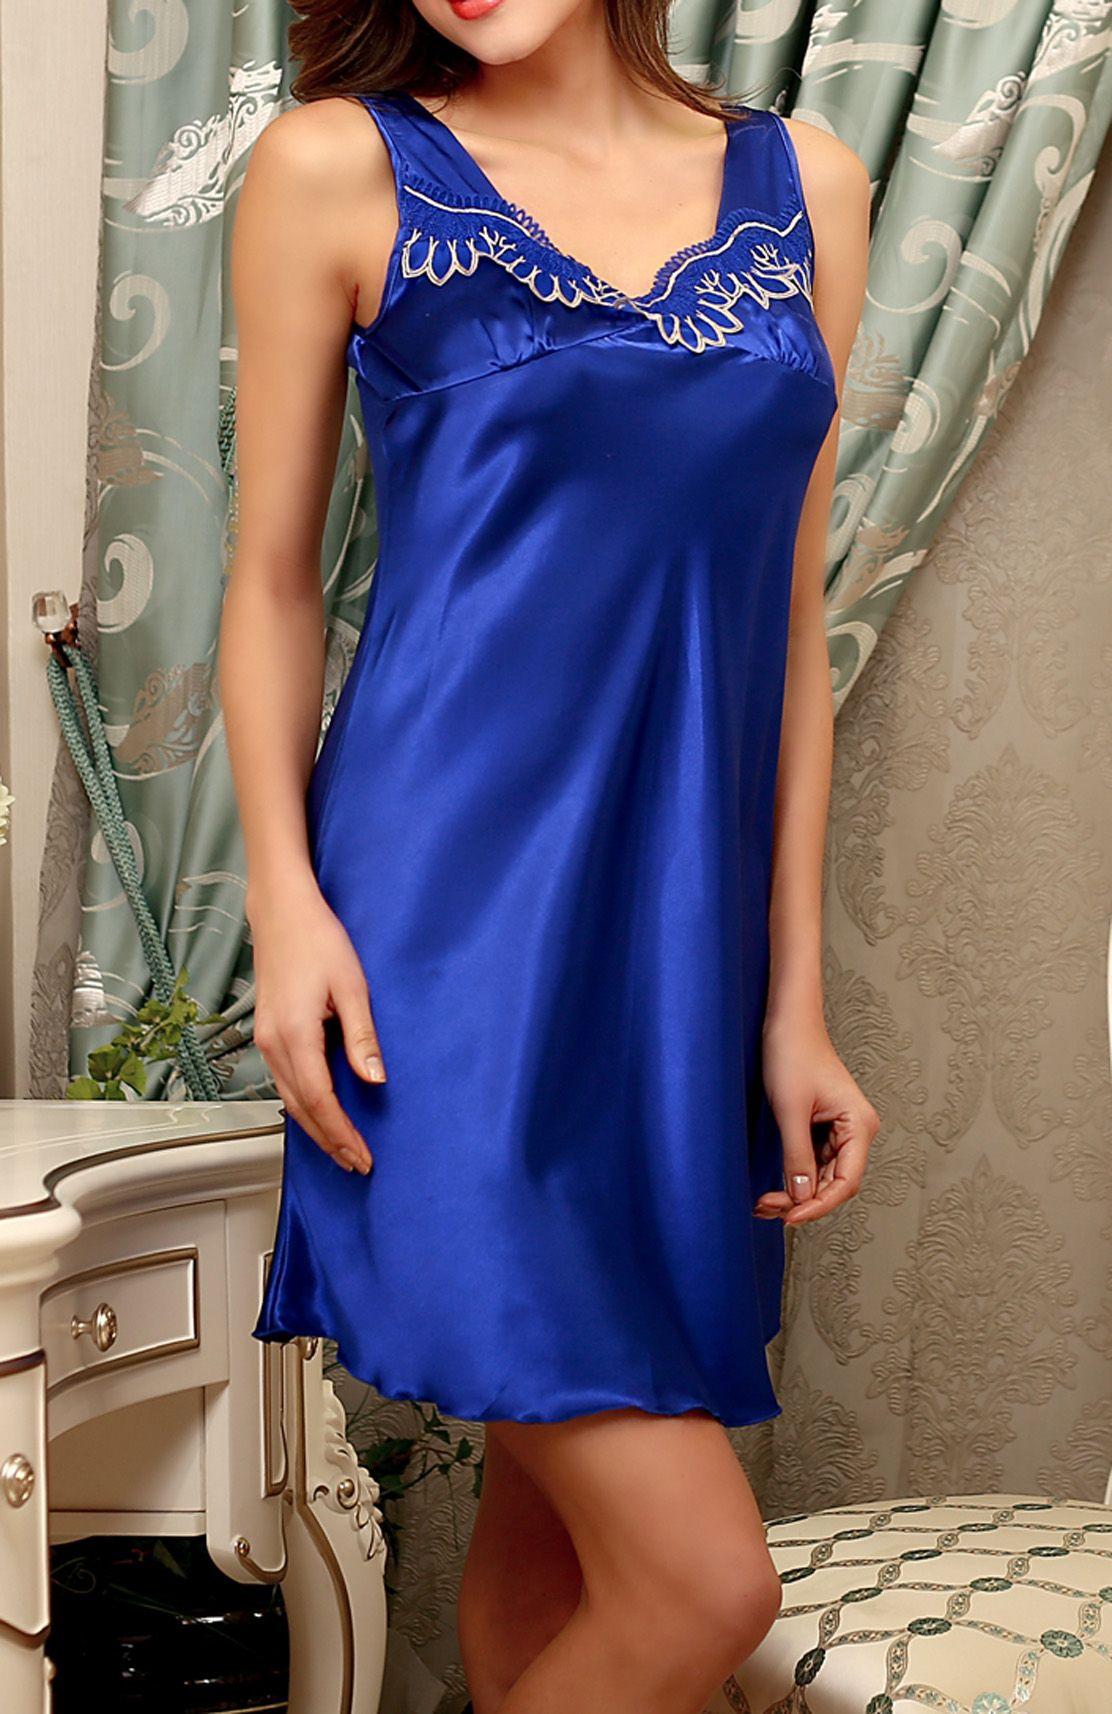 9e505f1e6a6 2019 Sexy Women Nightgowns Lace Sleeveless Girls Embroidery Tunic  Nightdress Nightwear Short Simulation Silk Satin Underwear Lingerie Plus  Size From ...